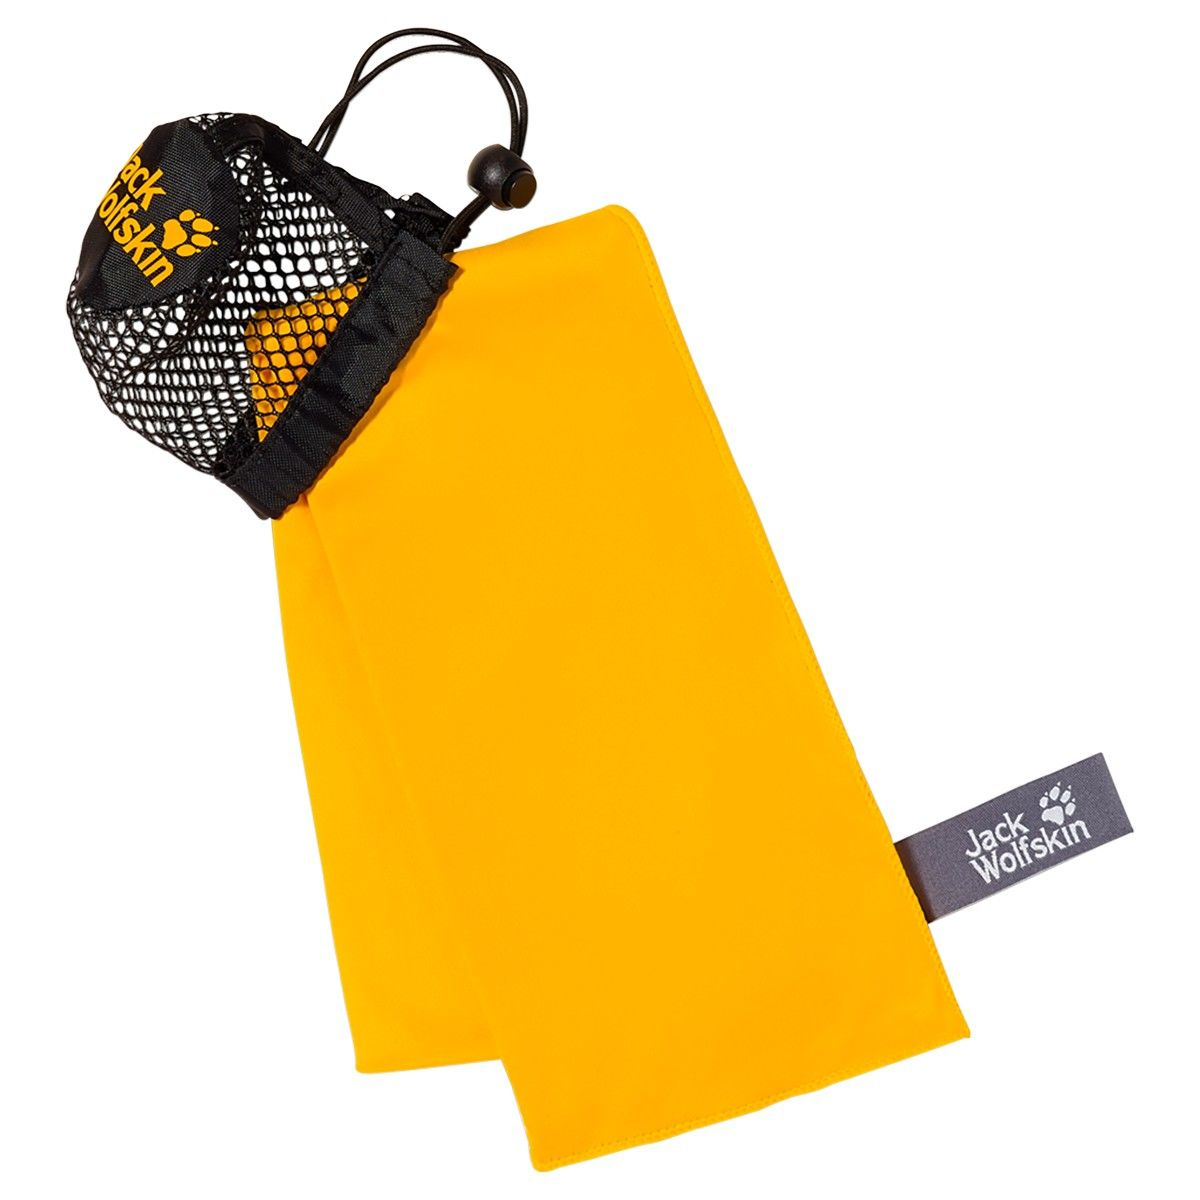 Jack Wolfskin Wolftowel Light XL   Größe One Size    Handtücher